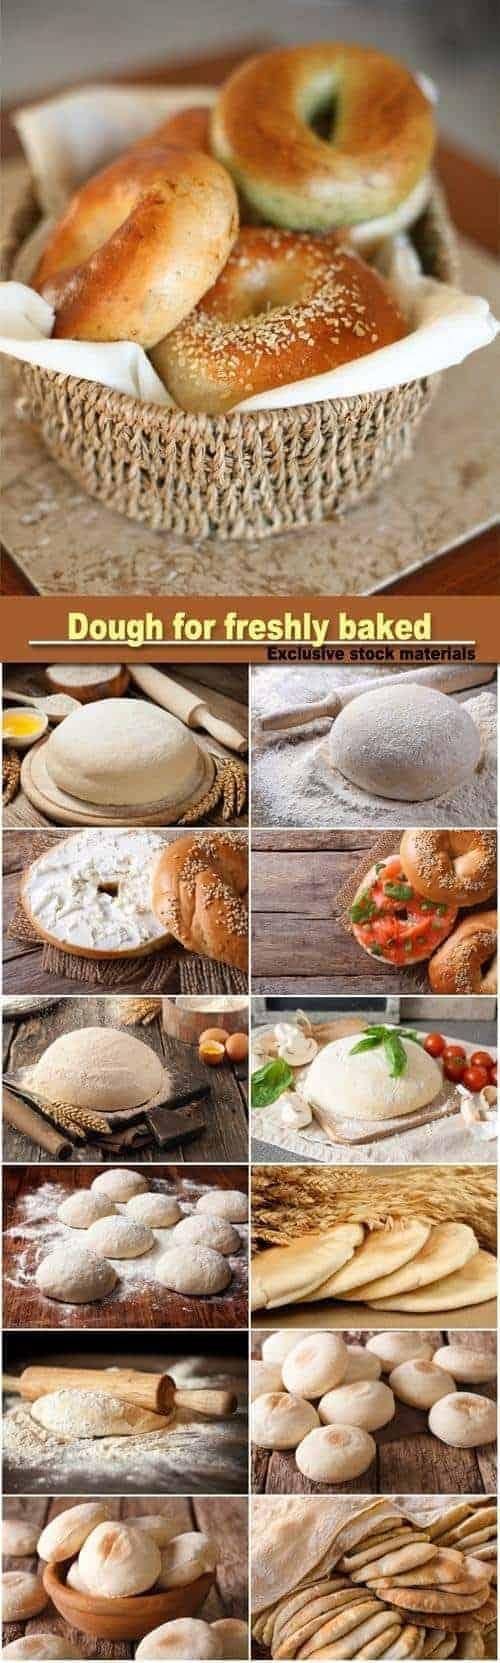 Сток-фото — Тесто для свежей выпечки